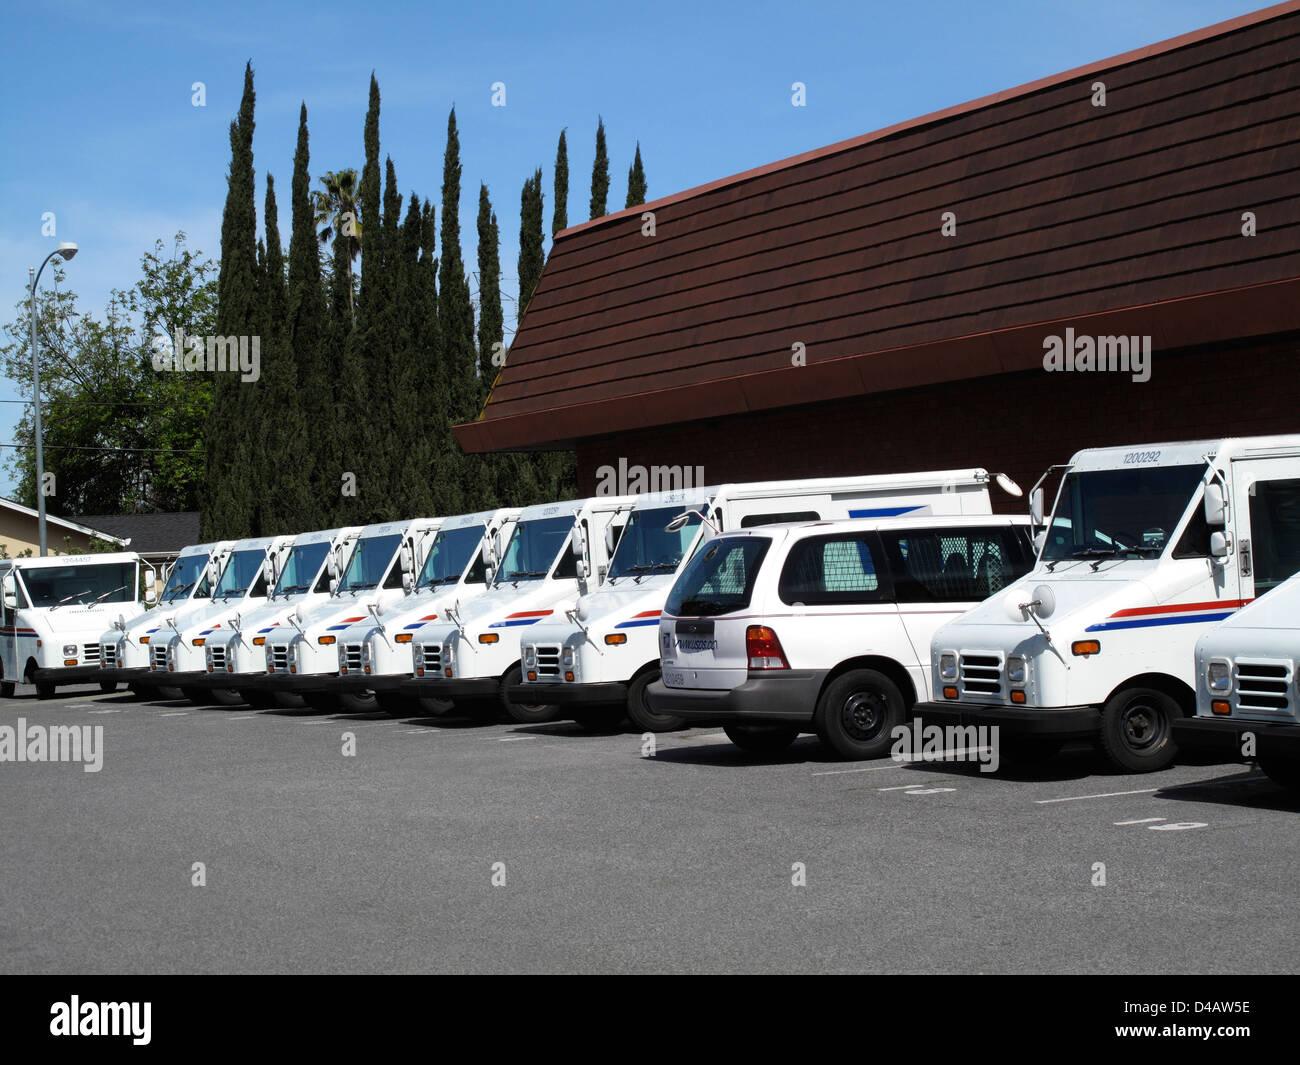 US Postal Service postal vehicles parked at Cambrian Post Office, San Jose California - Stock Image